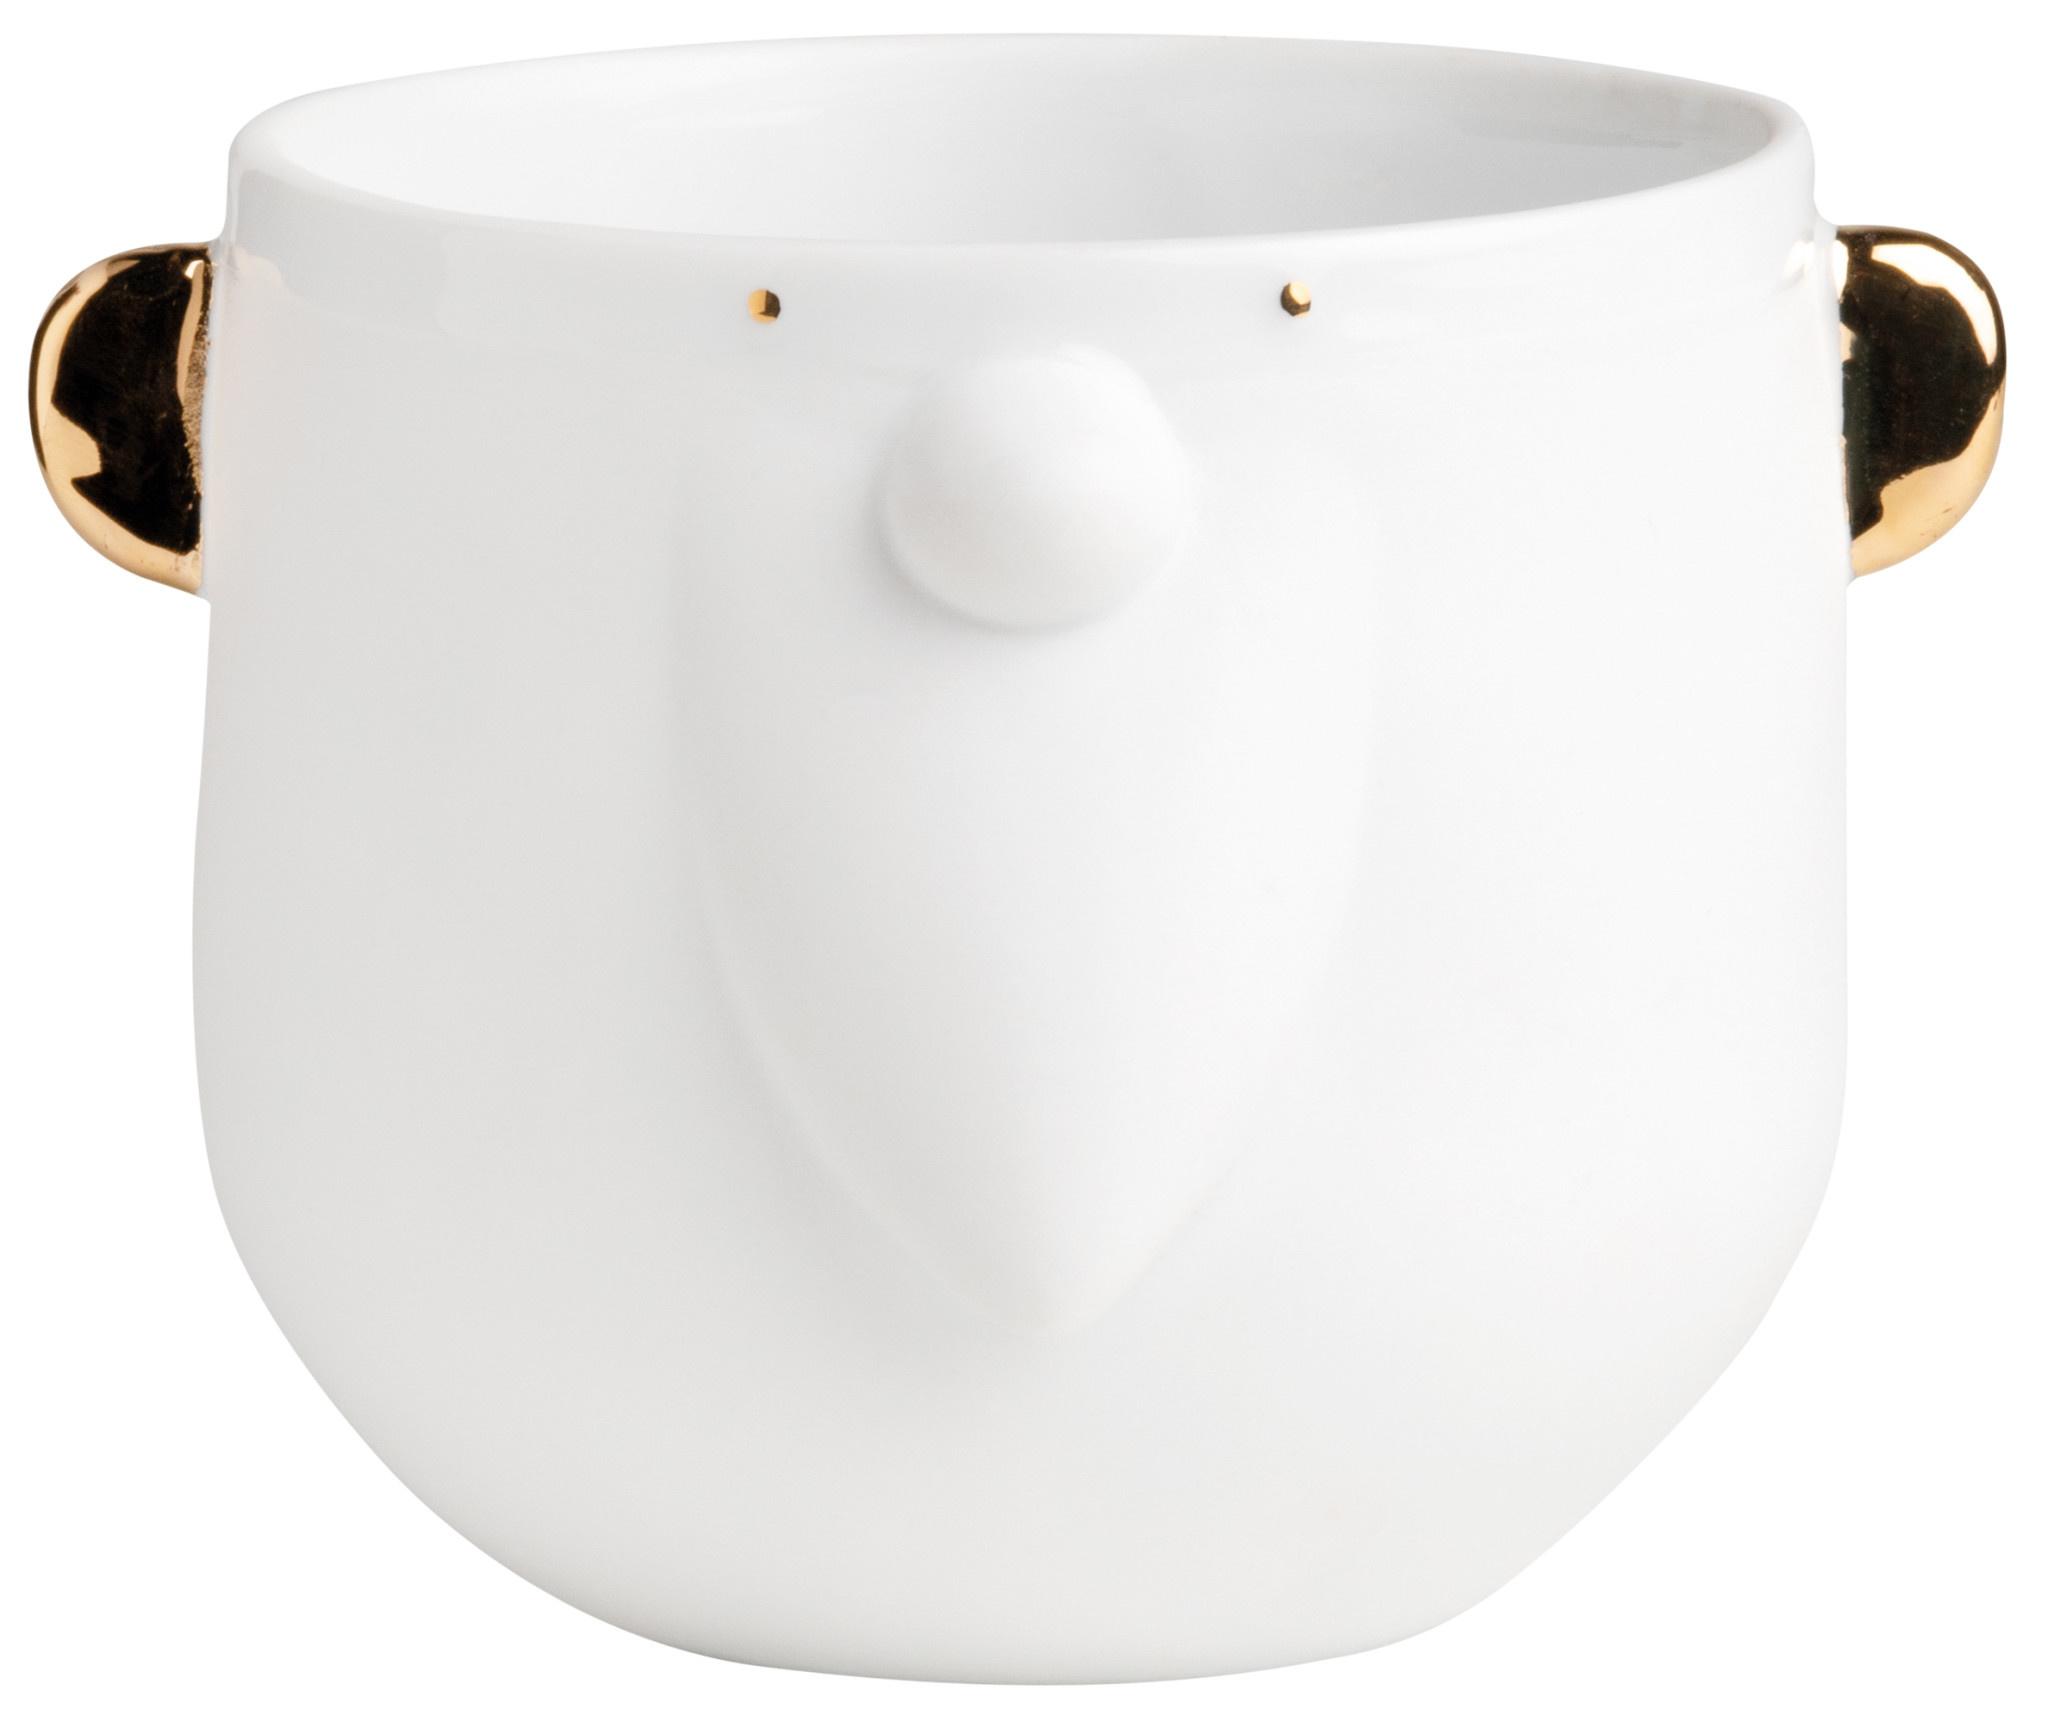 Räder Porseleinen beker/pot Santa D 9.5 cm / H 8.5 cm